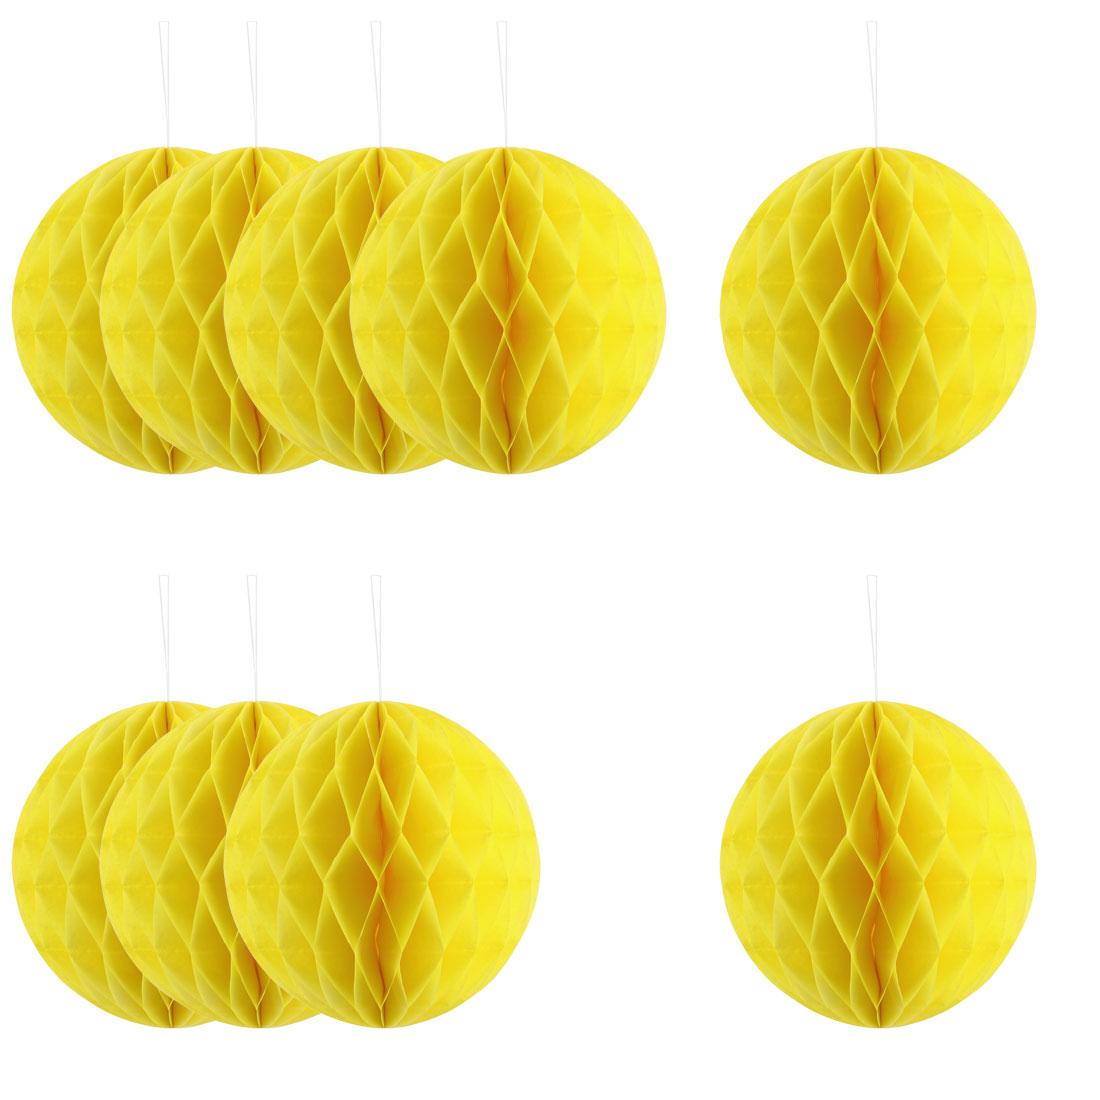 Festival Paper Handmade DIY Hanging Decor Honeycomb Ball Lantern Yellow 8 Inches 10pcs